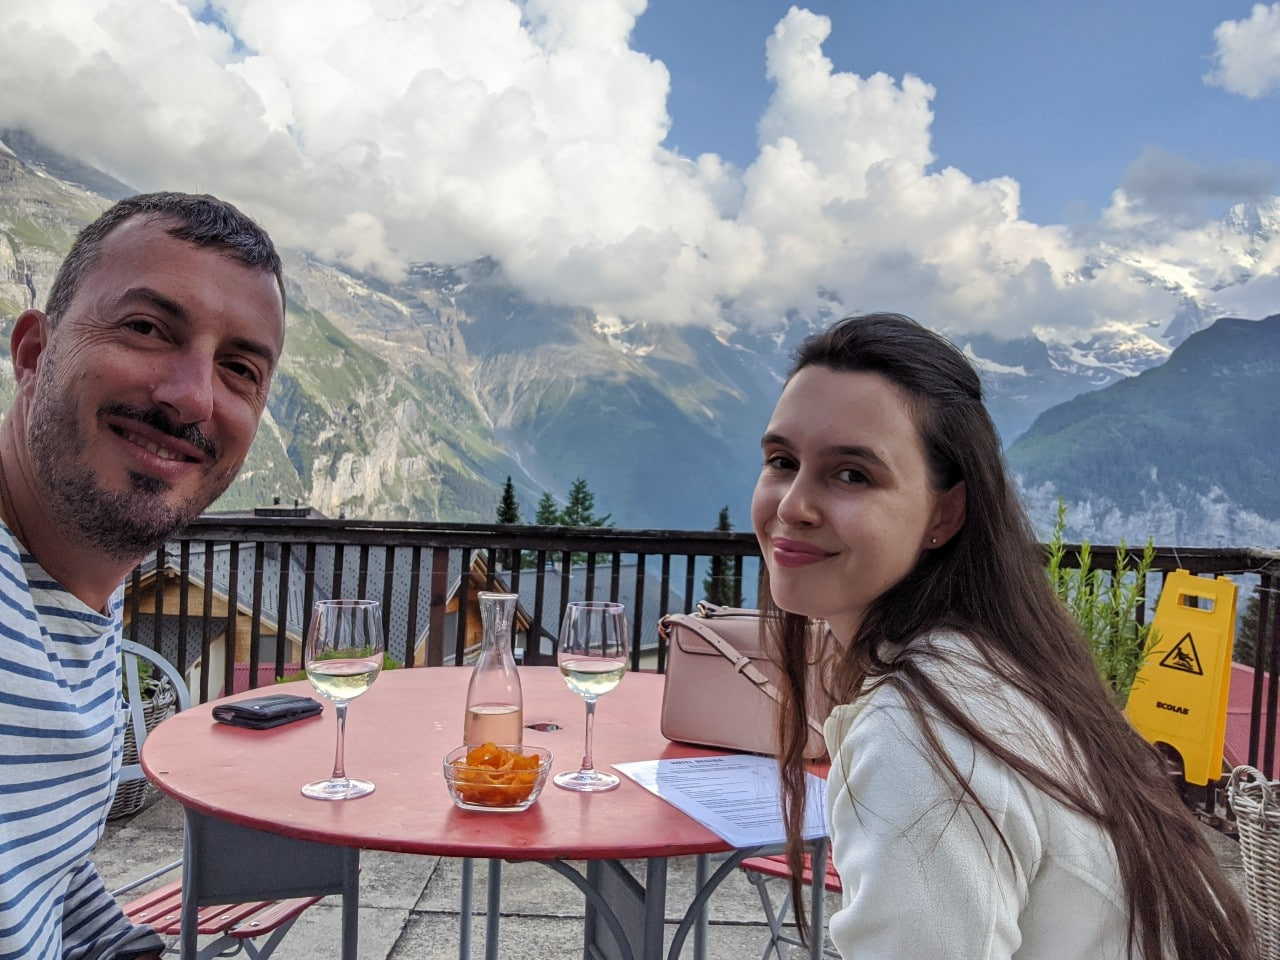 Solène (on the right) and Matthias having an aperitif on the balcony of hotel Regina in Mürren, Switzerland